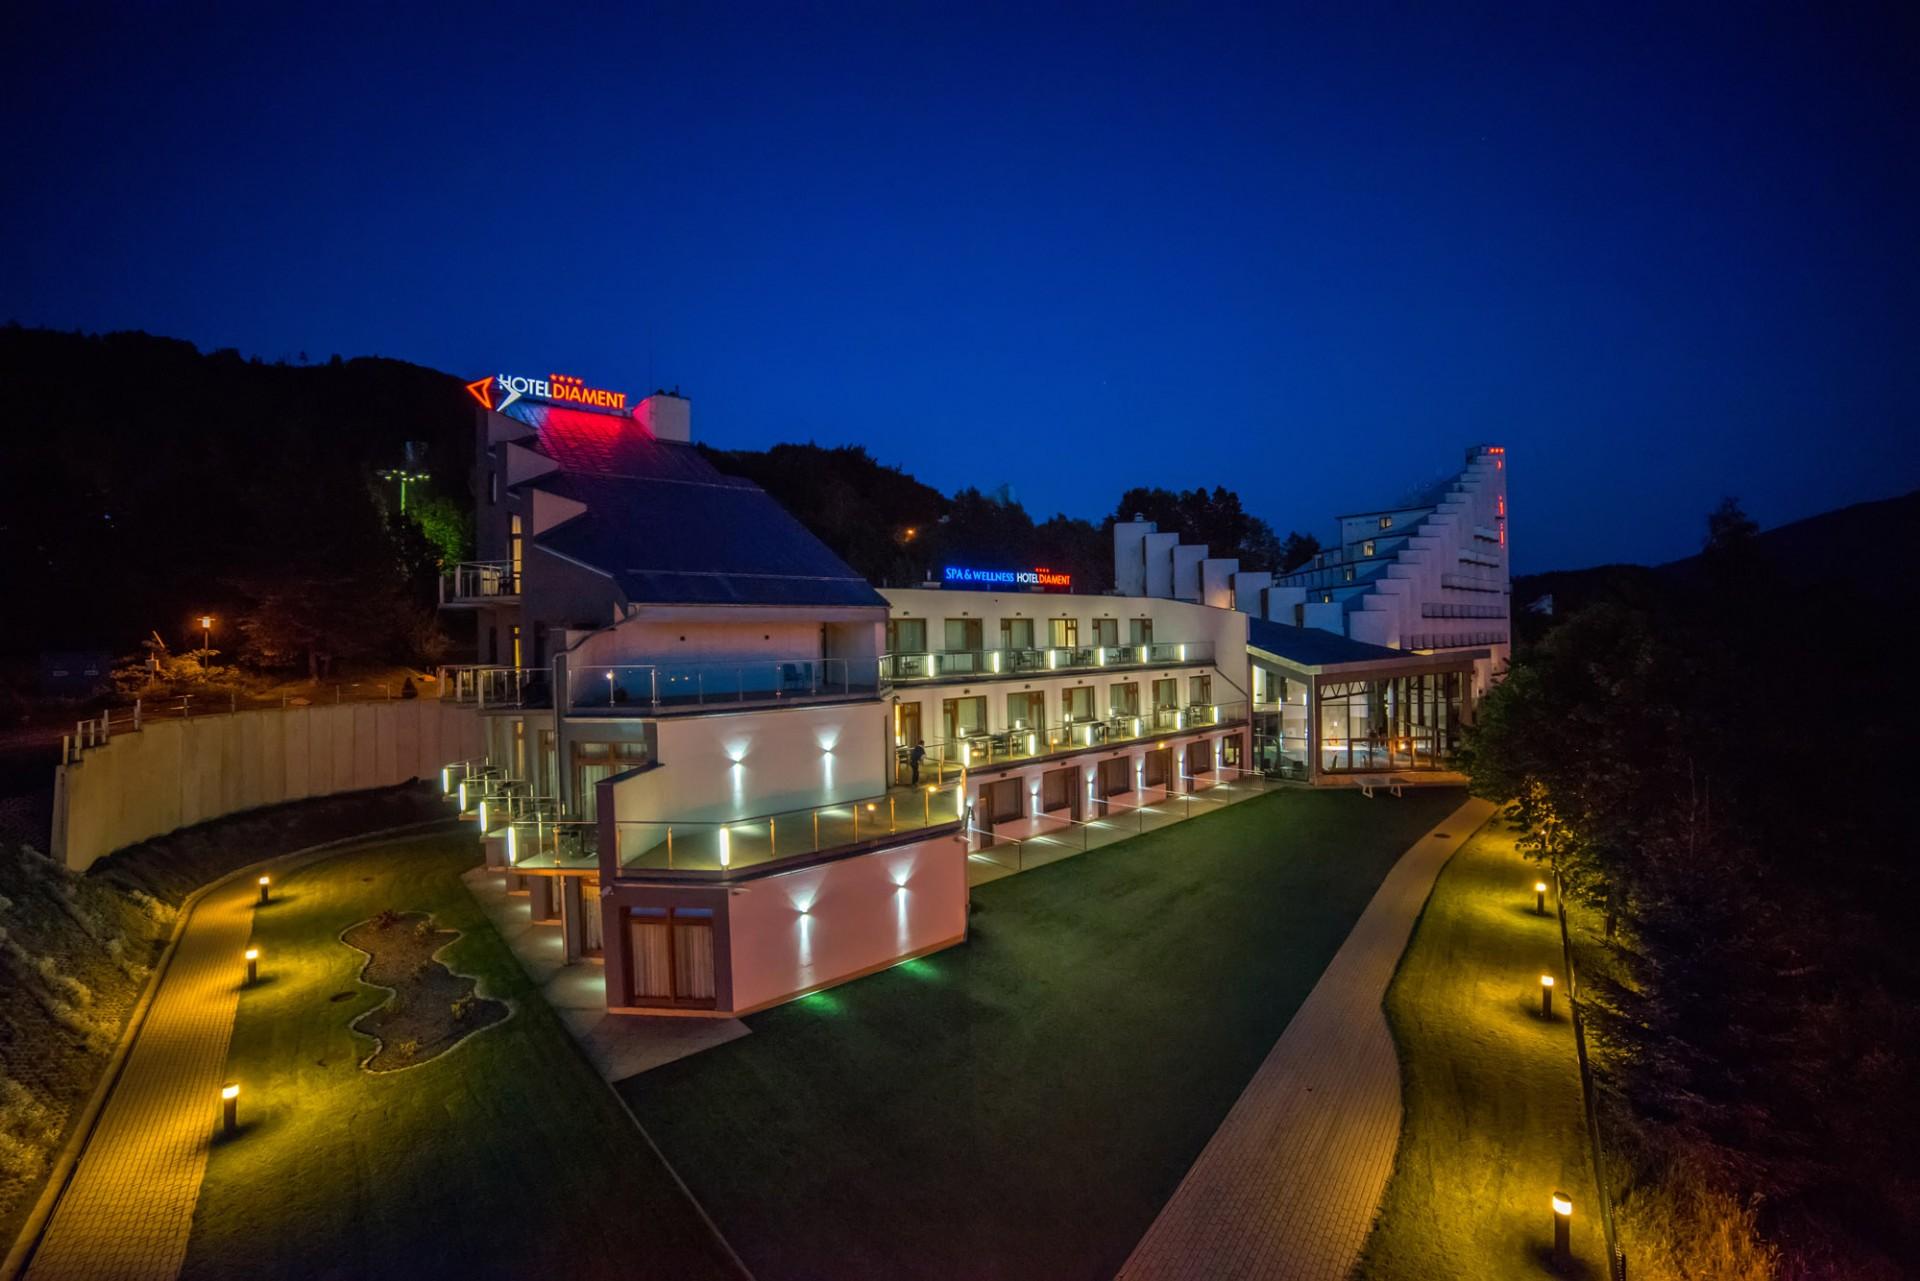 Diament Spa Hotel - Ustroń